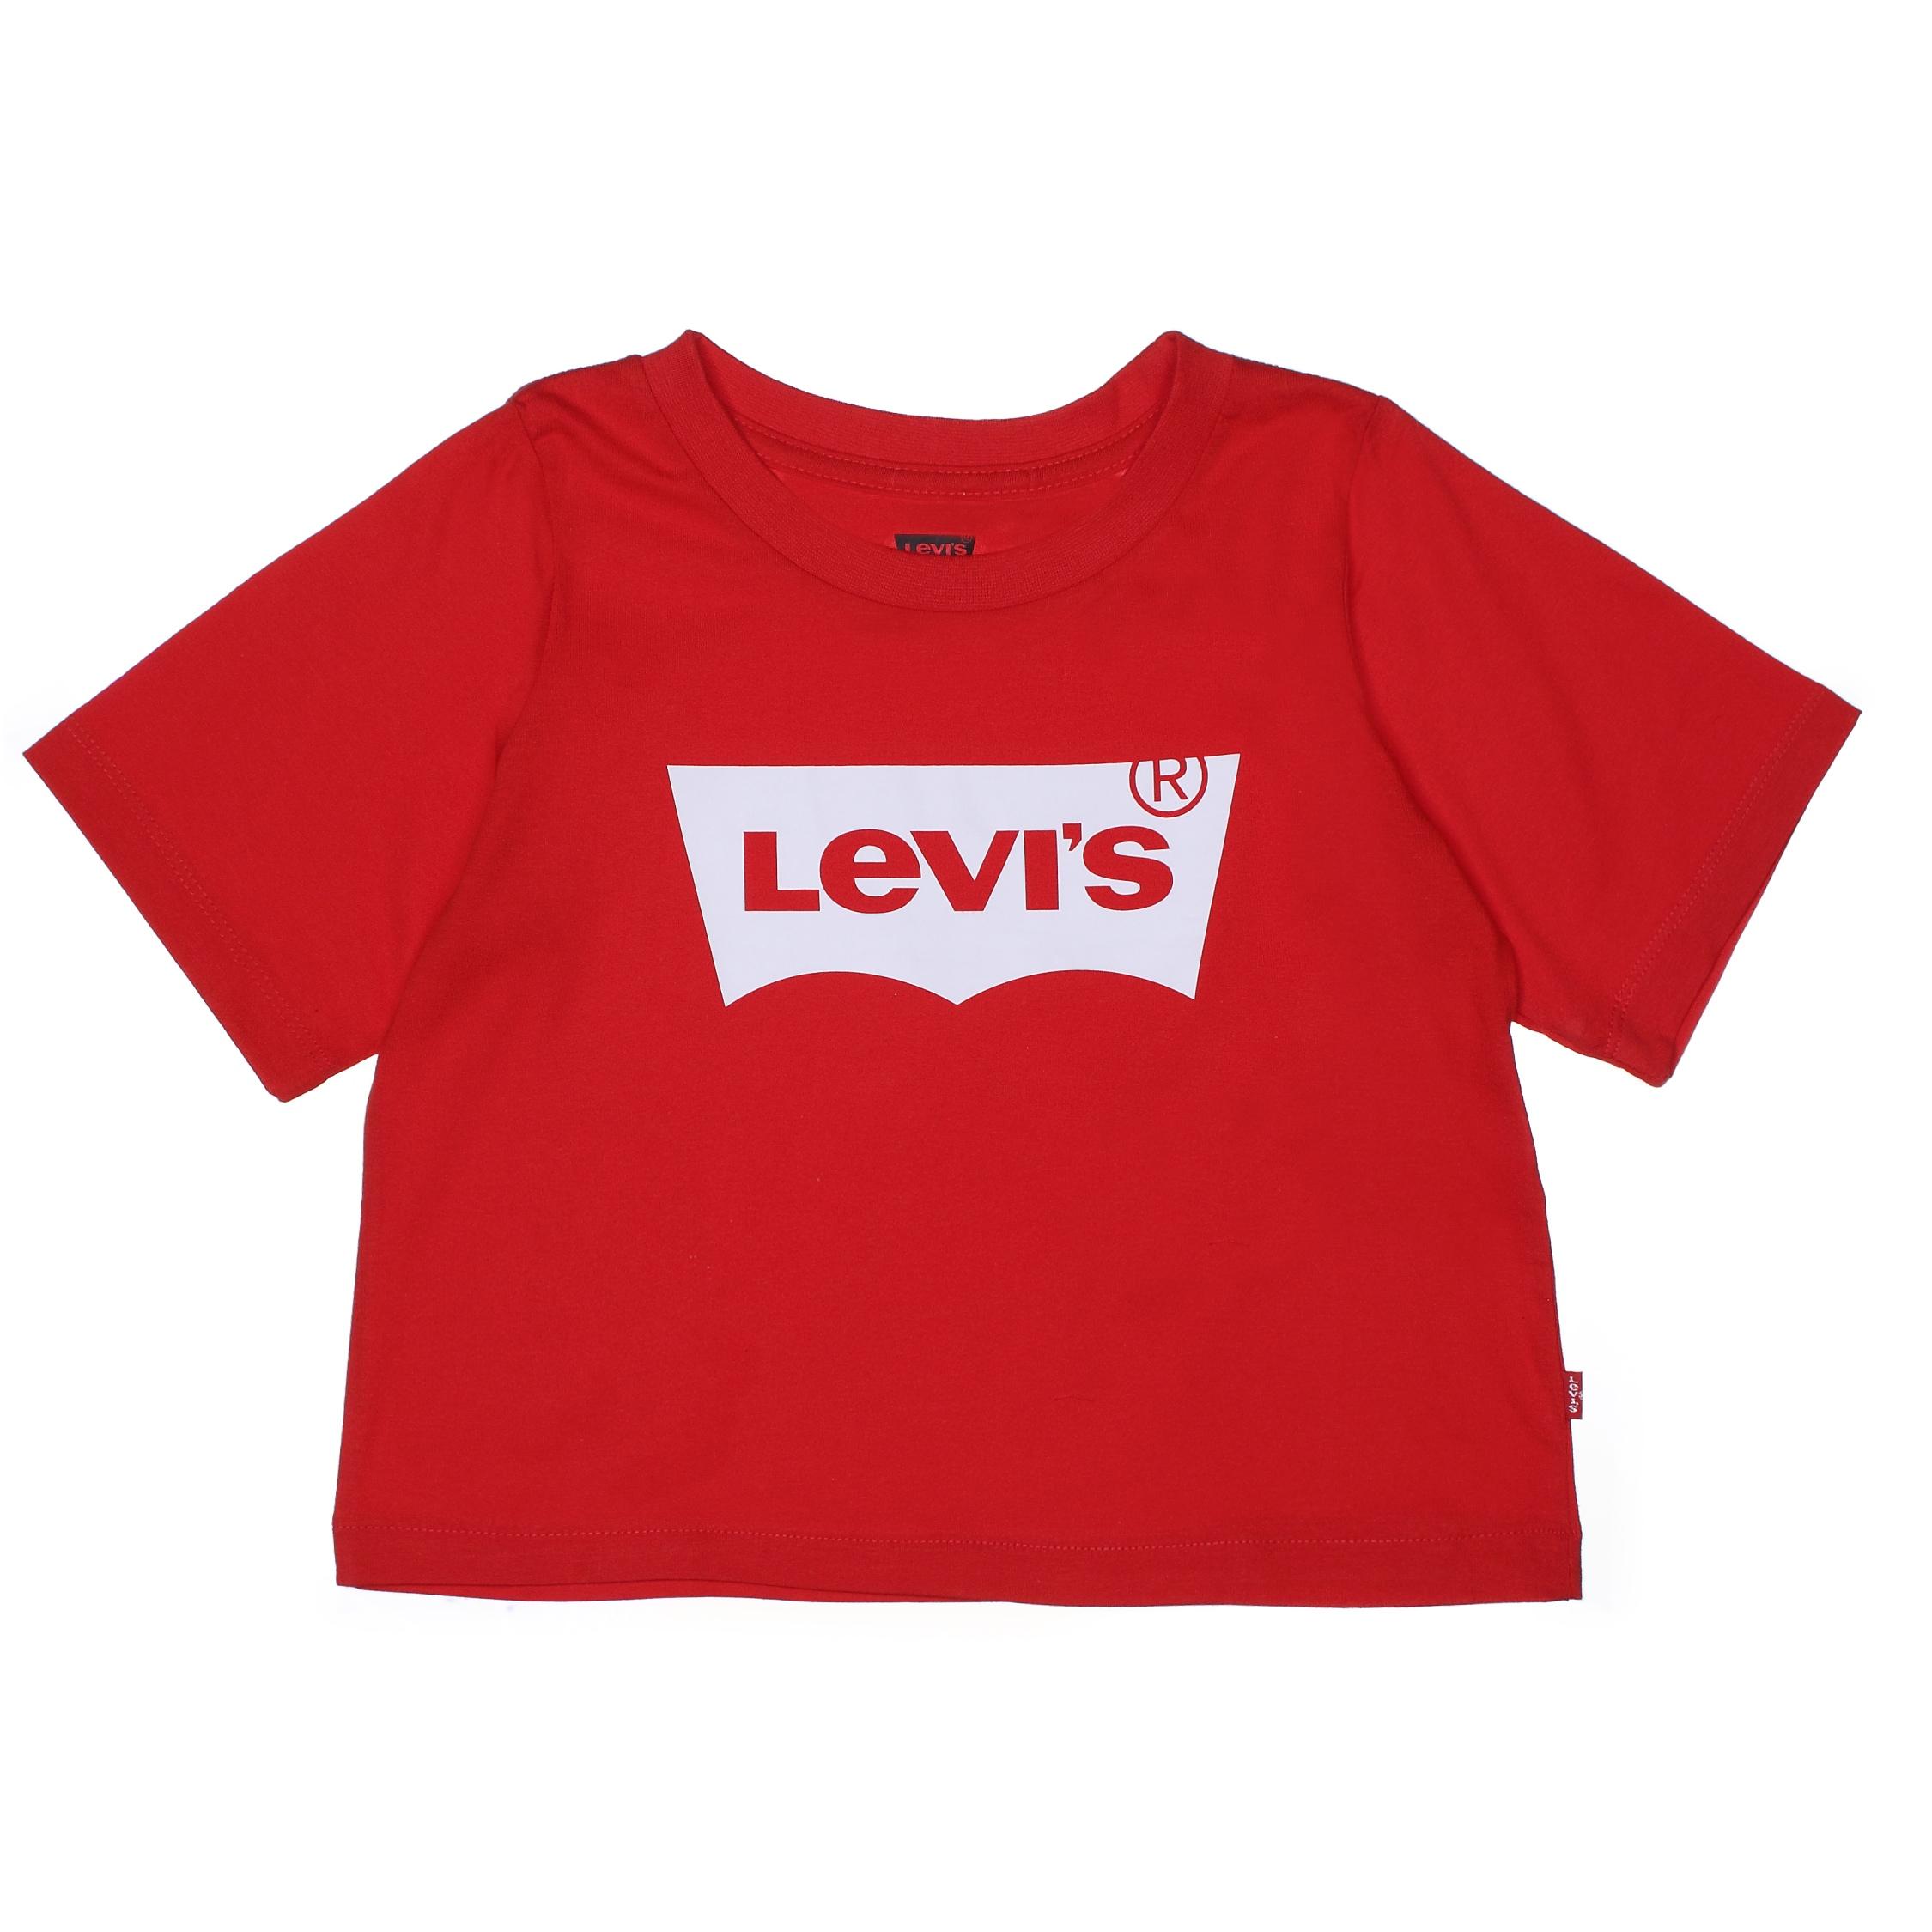 http://www.leadermode.com/183923/levi-s-kids-0220-r6w-super-red.jpg